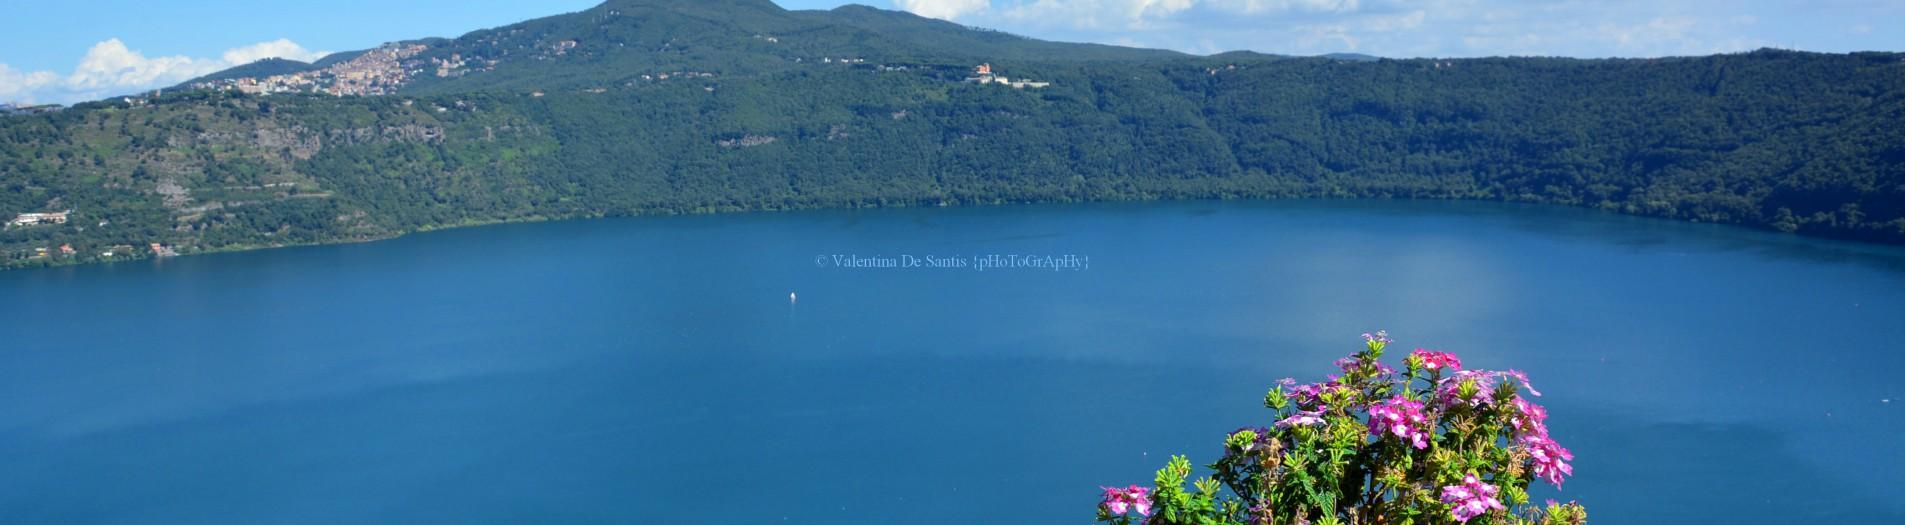 Castel Gandolfo, view of Lake Albano and Monte Cavo